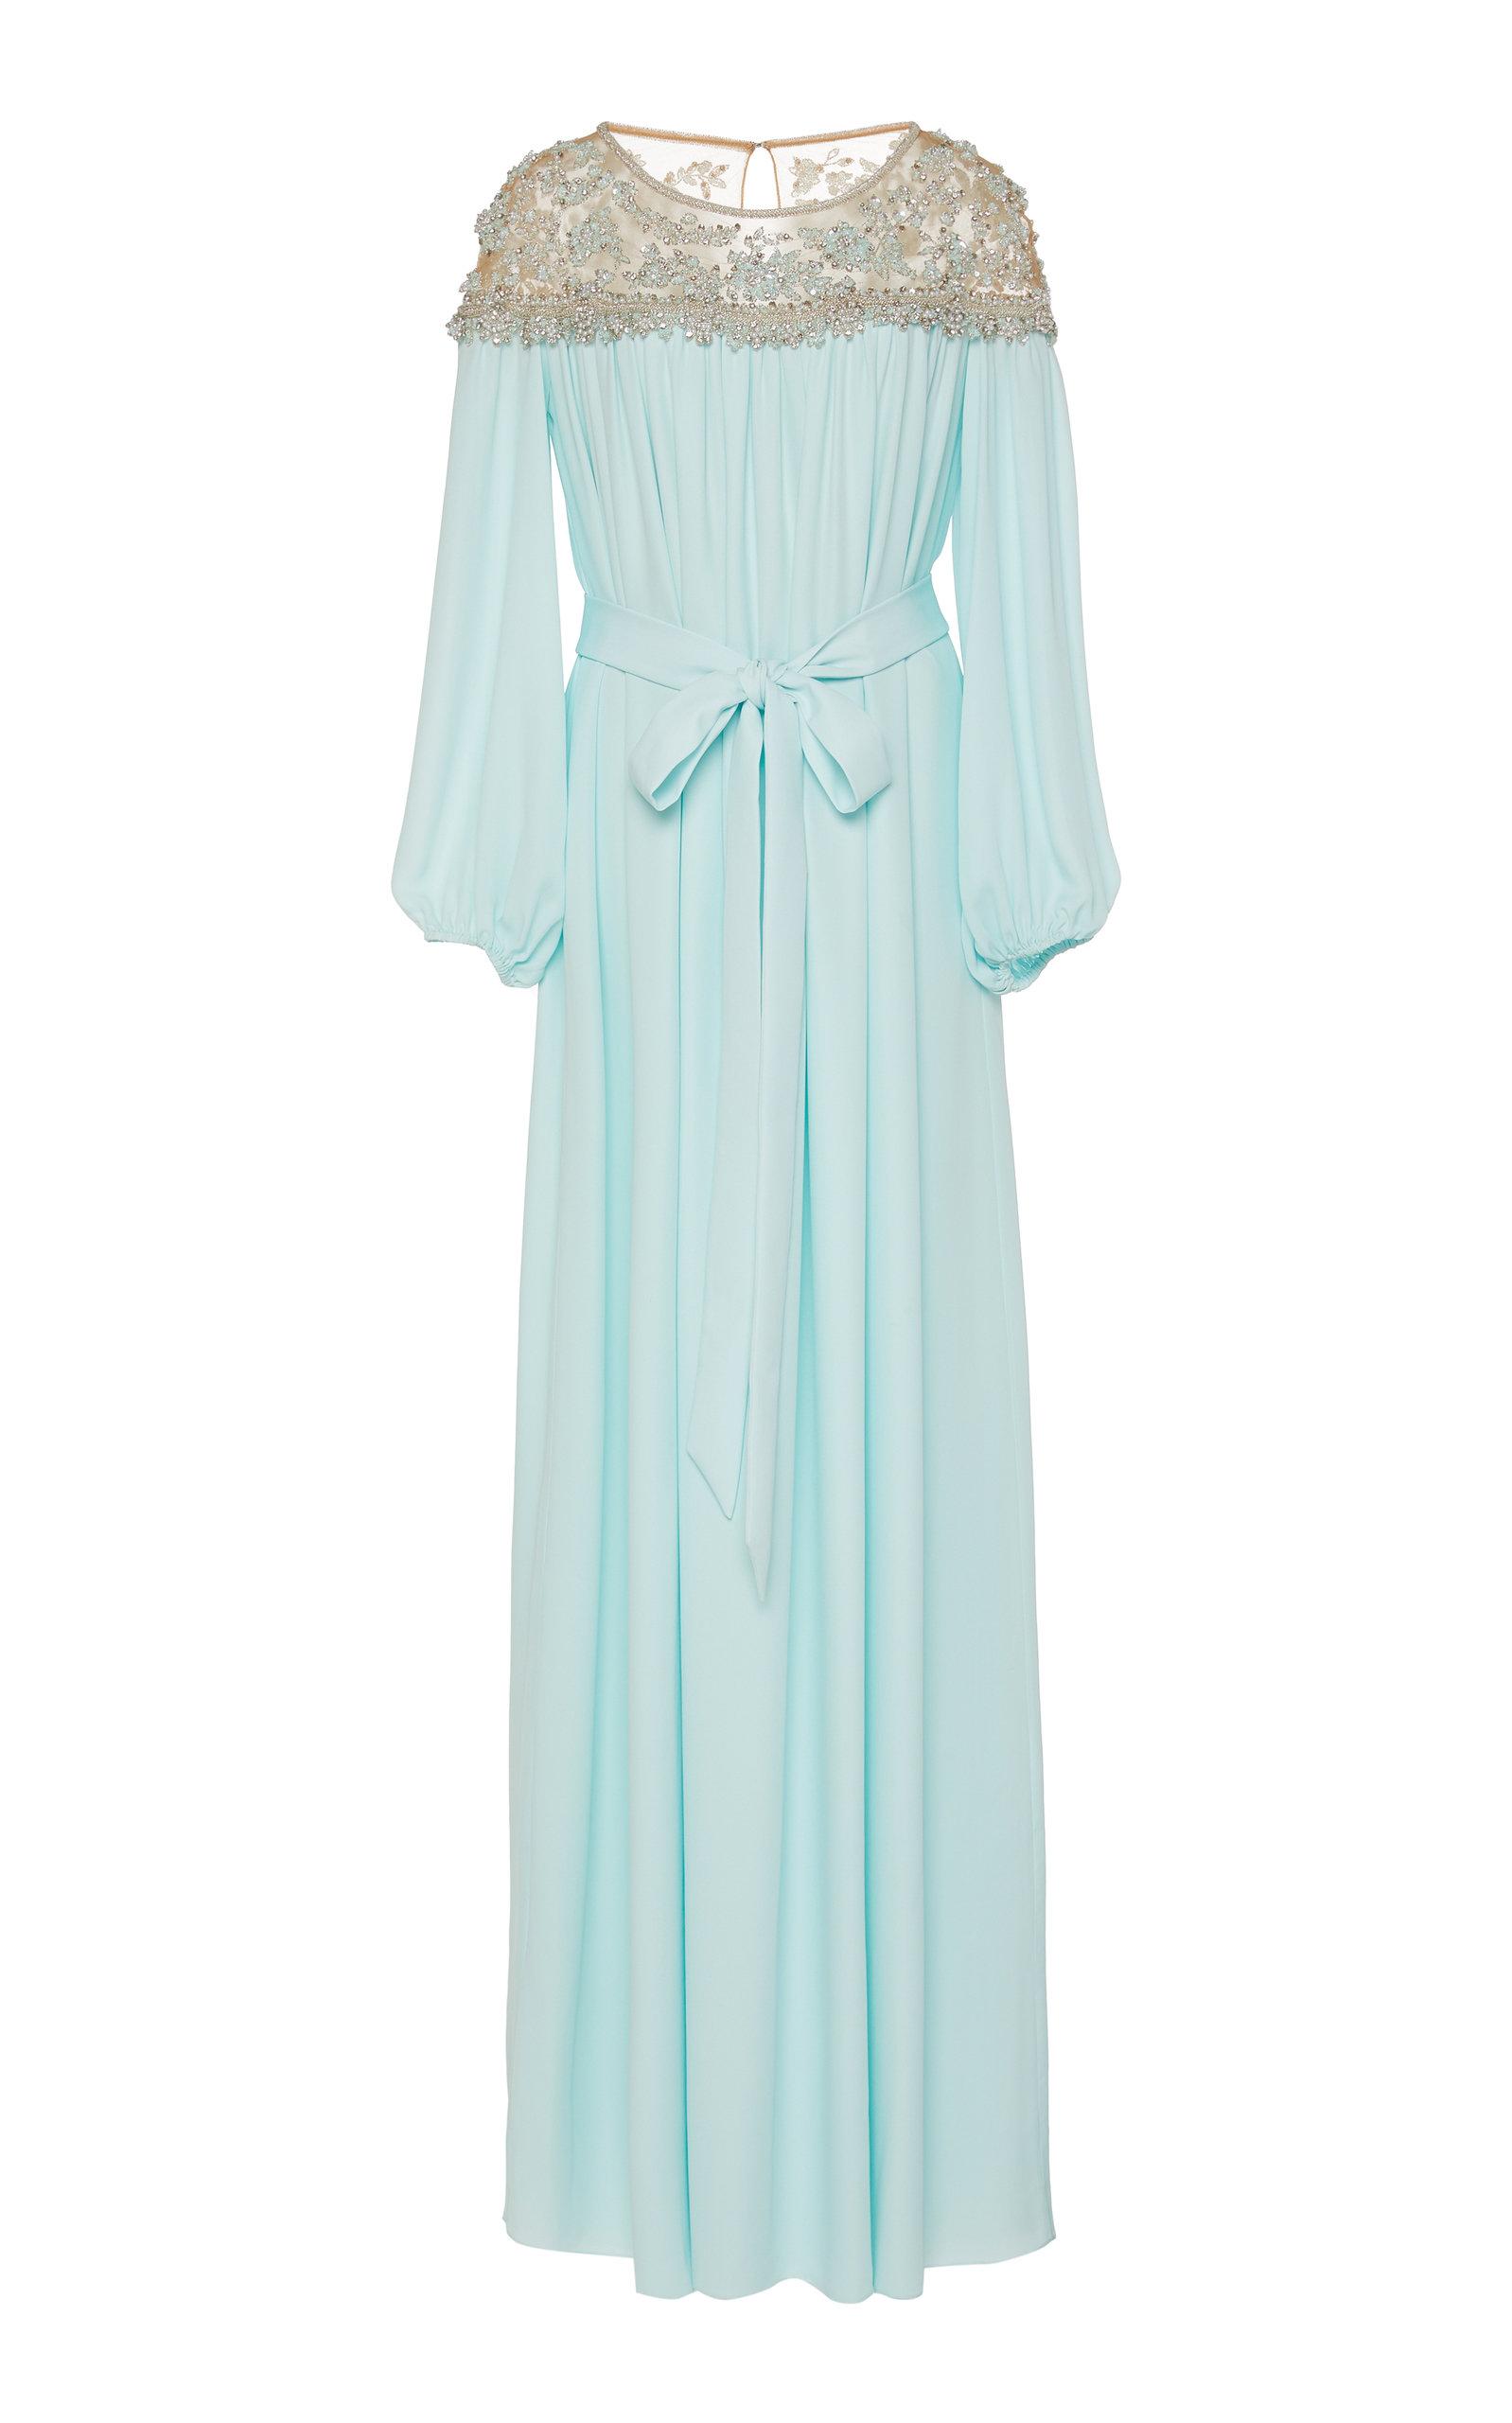 Marchesa Dresses Crystal And Pearl Embellished Silk-Georgette Caftan Dress